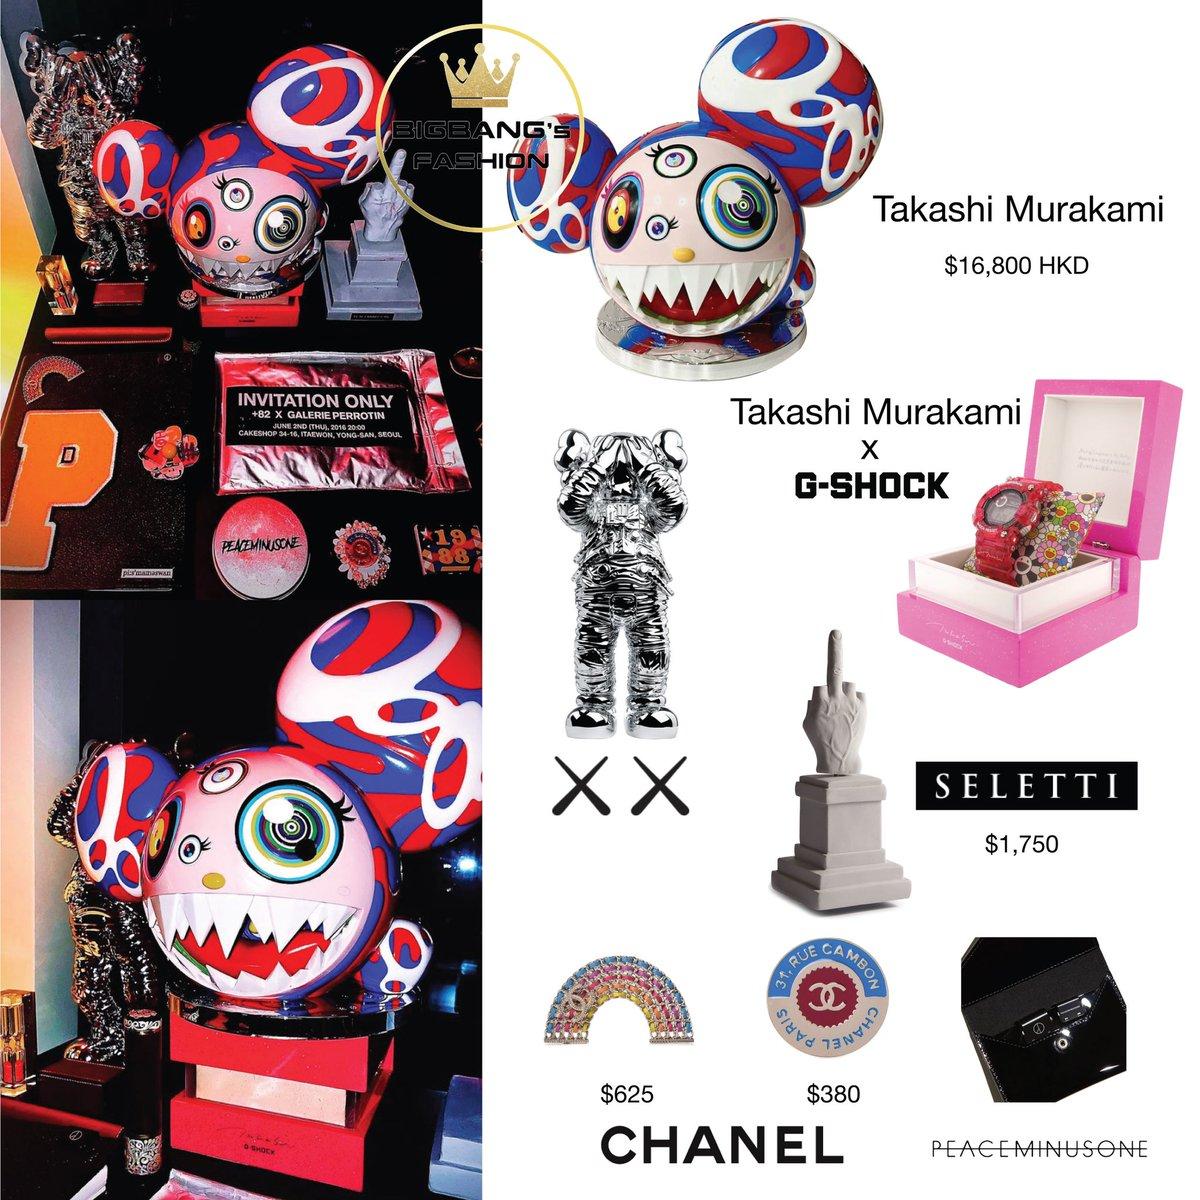 210119 xxxibgdrgn IG Update   ✨ #TakashiMurakami Melting DOB  ✨ #TakashiMurakami x #GShock Frogman watch  ✨ #Kaws Space  ✨ #Chanel brooch ✨ #Seletti L.O.V.E  ✨ #PEACEMINUSONE Slider clip  #GD #GDRAGON #BIGBANG #GDSTYLE